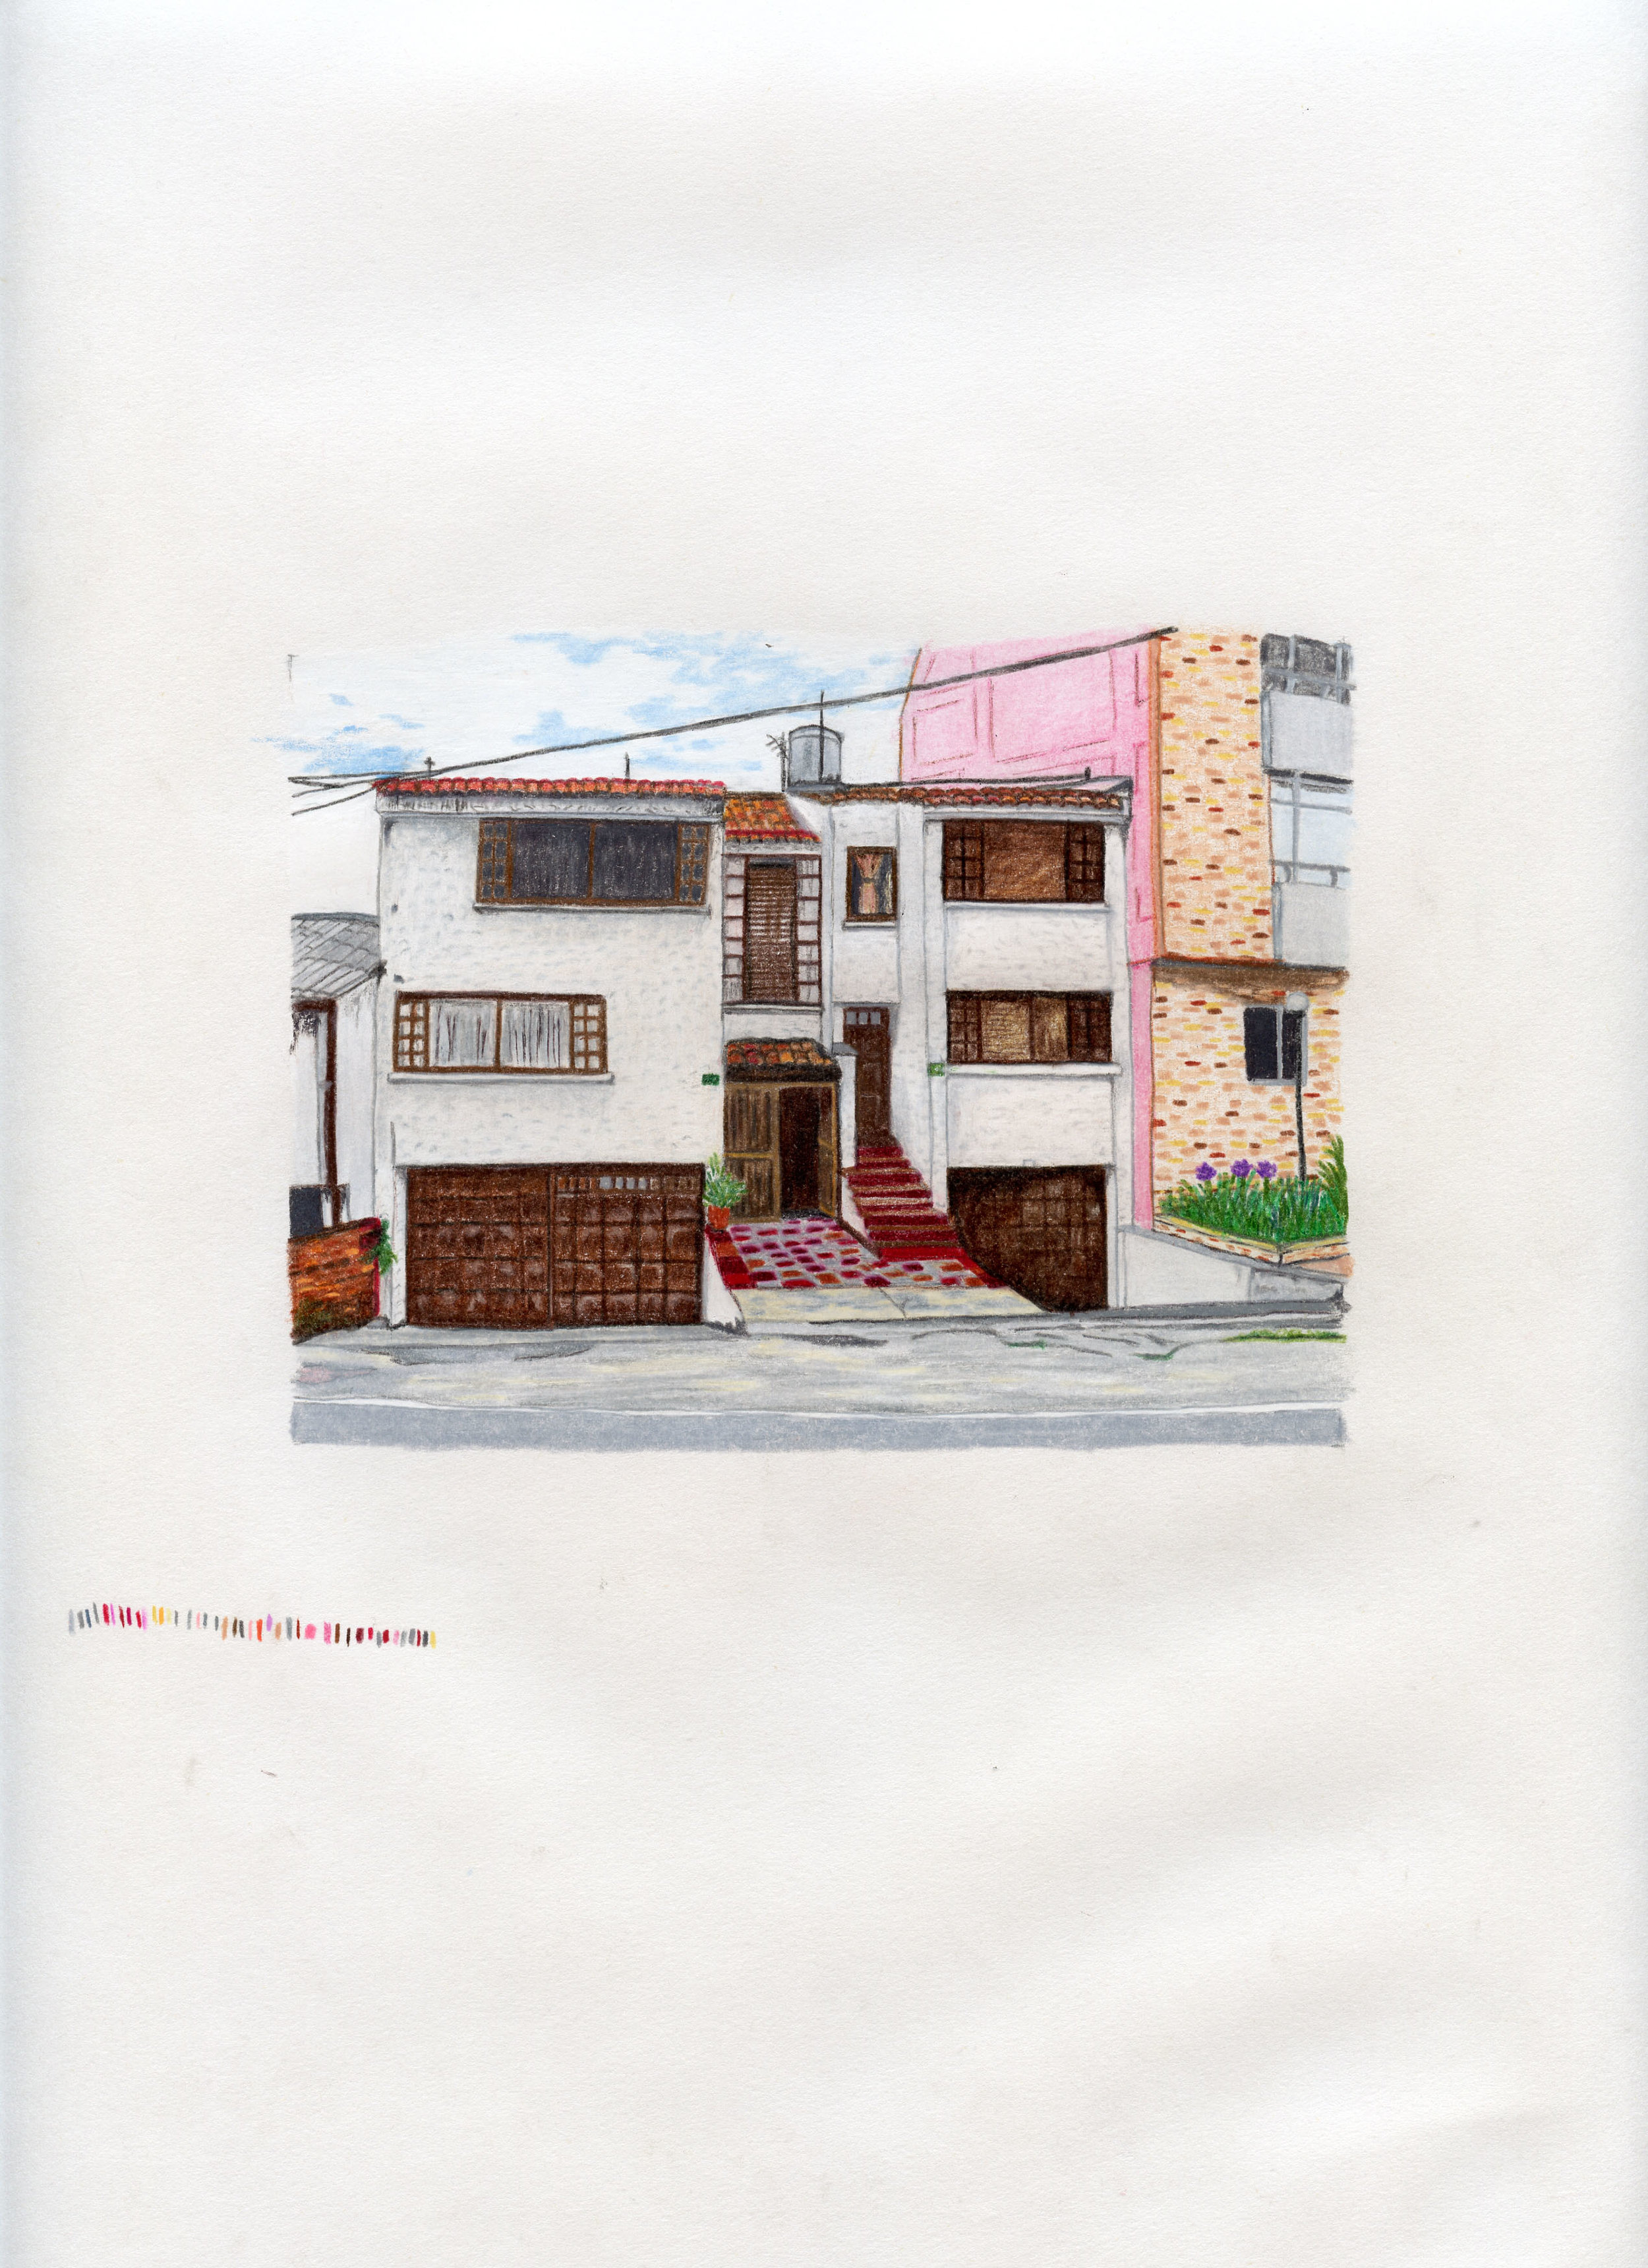 """Estudios de caso""   Lápices de colores sobre papel   25 x 35 cm   Serie de 20 dibujos   2010 - 2015"